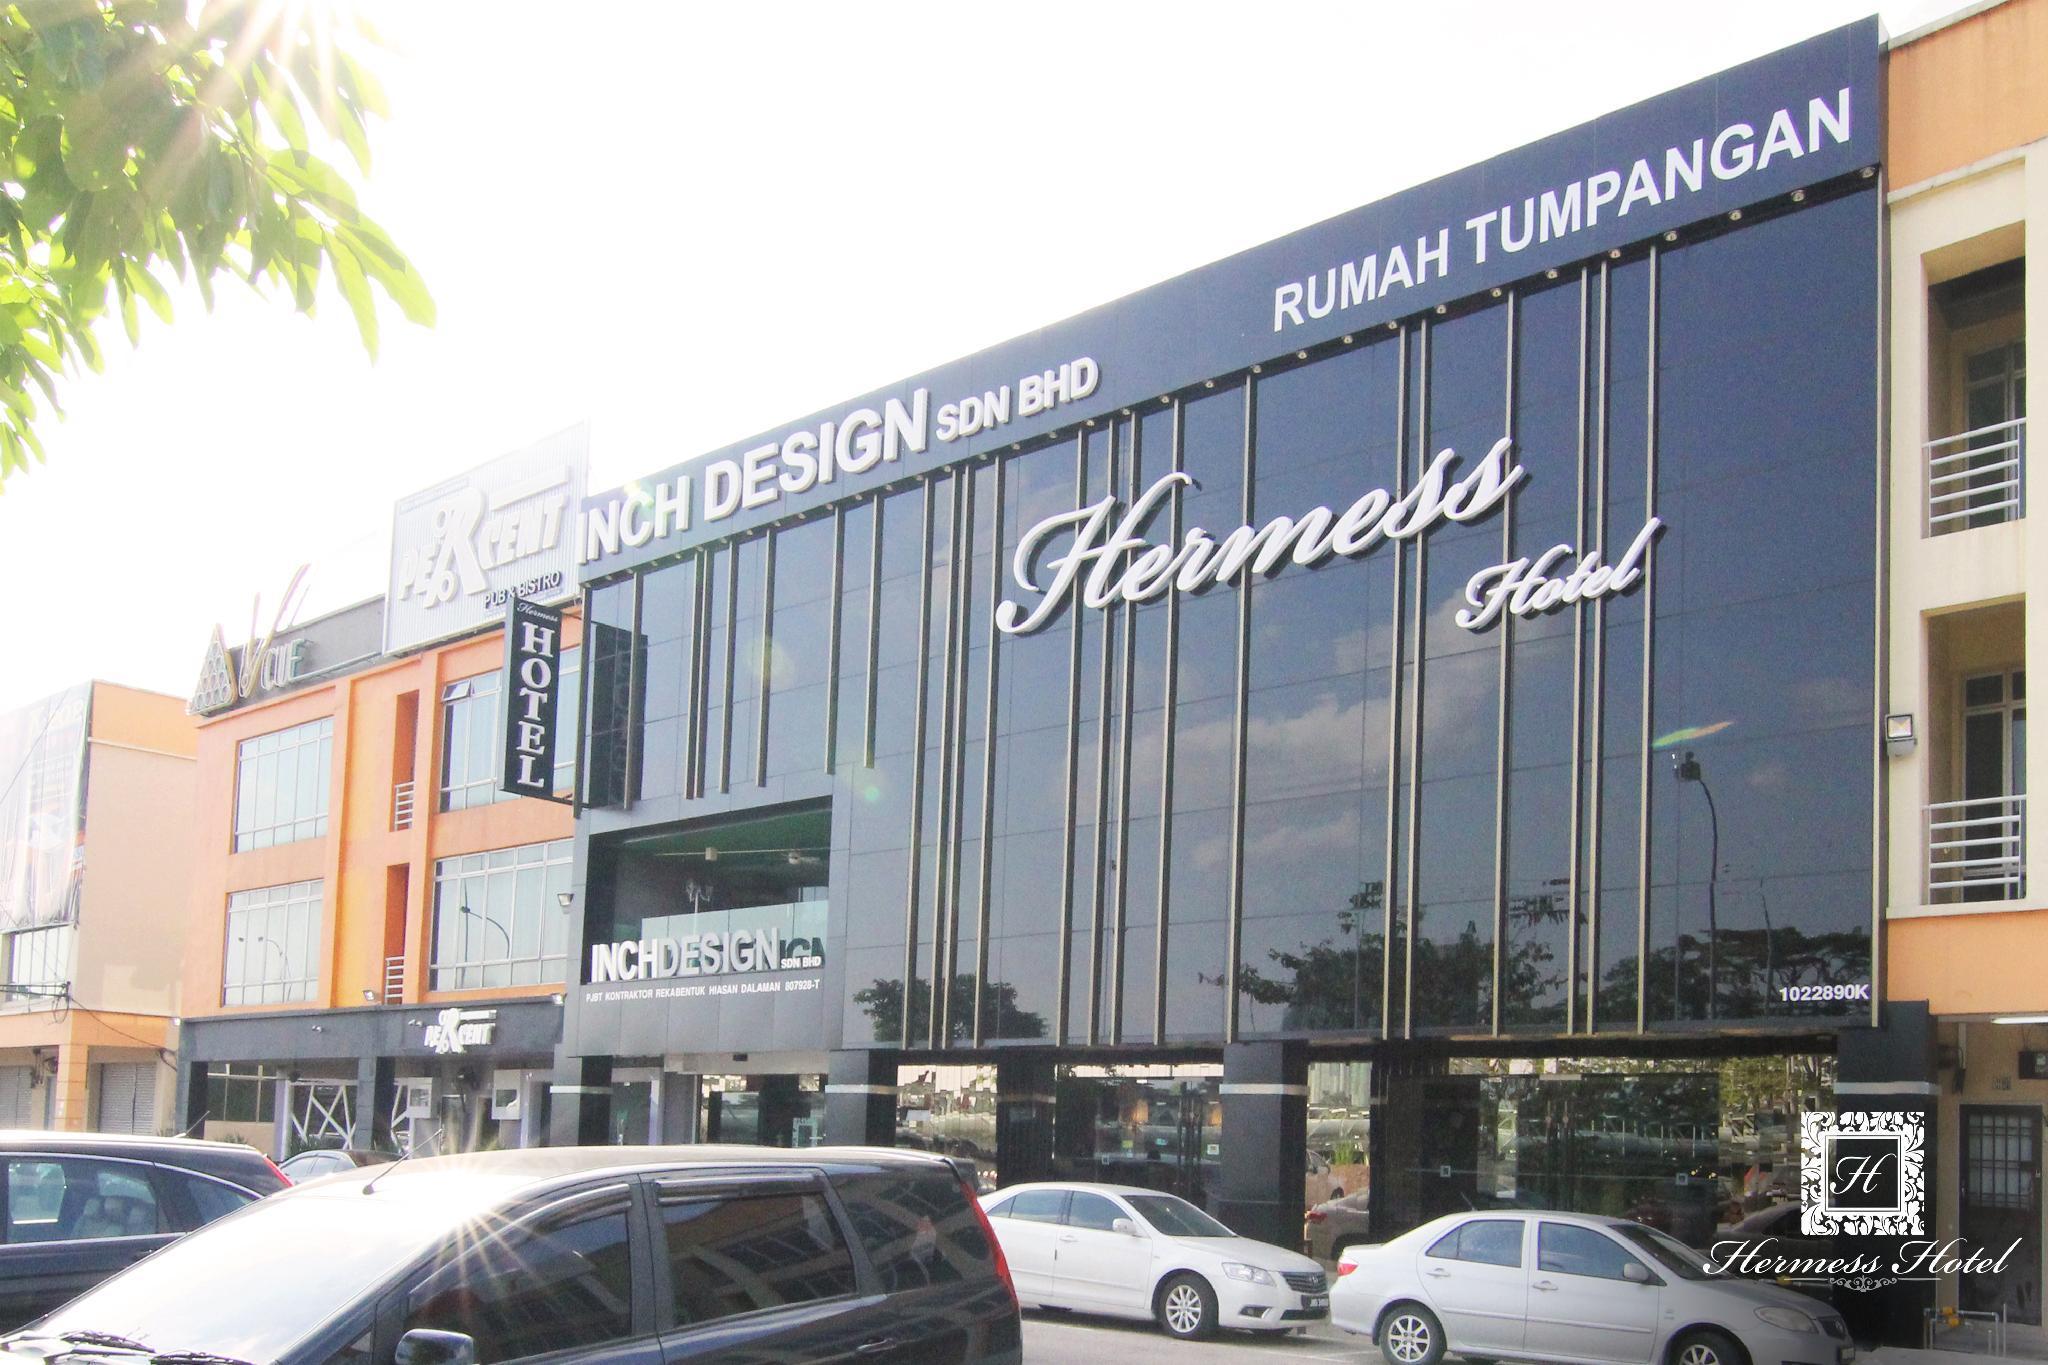 Hermess Hotel in Johor Bahru - Room Deals, Photos & Reviews